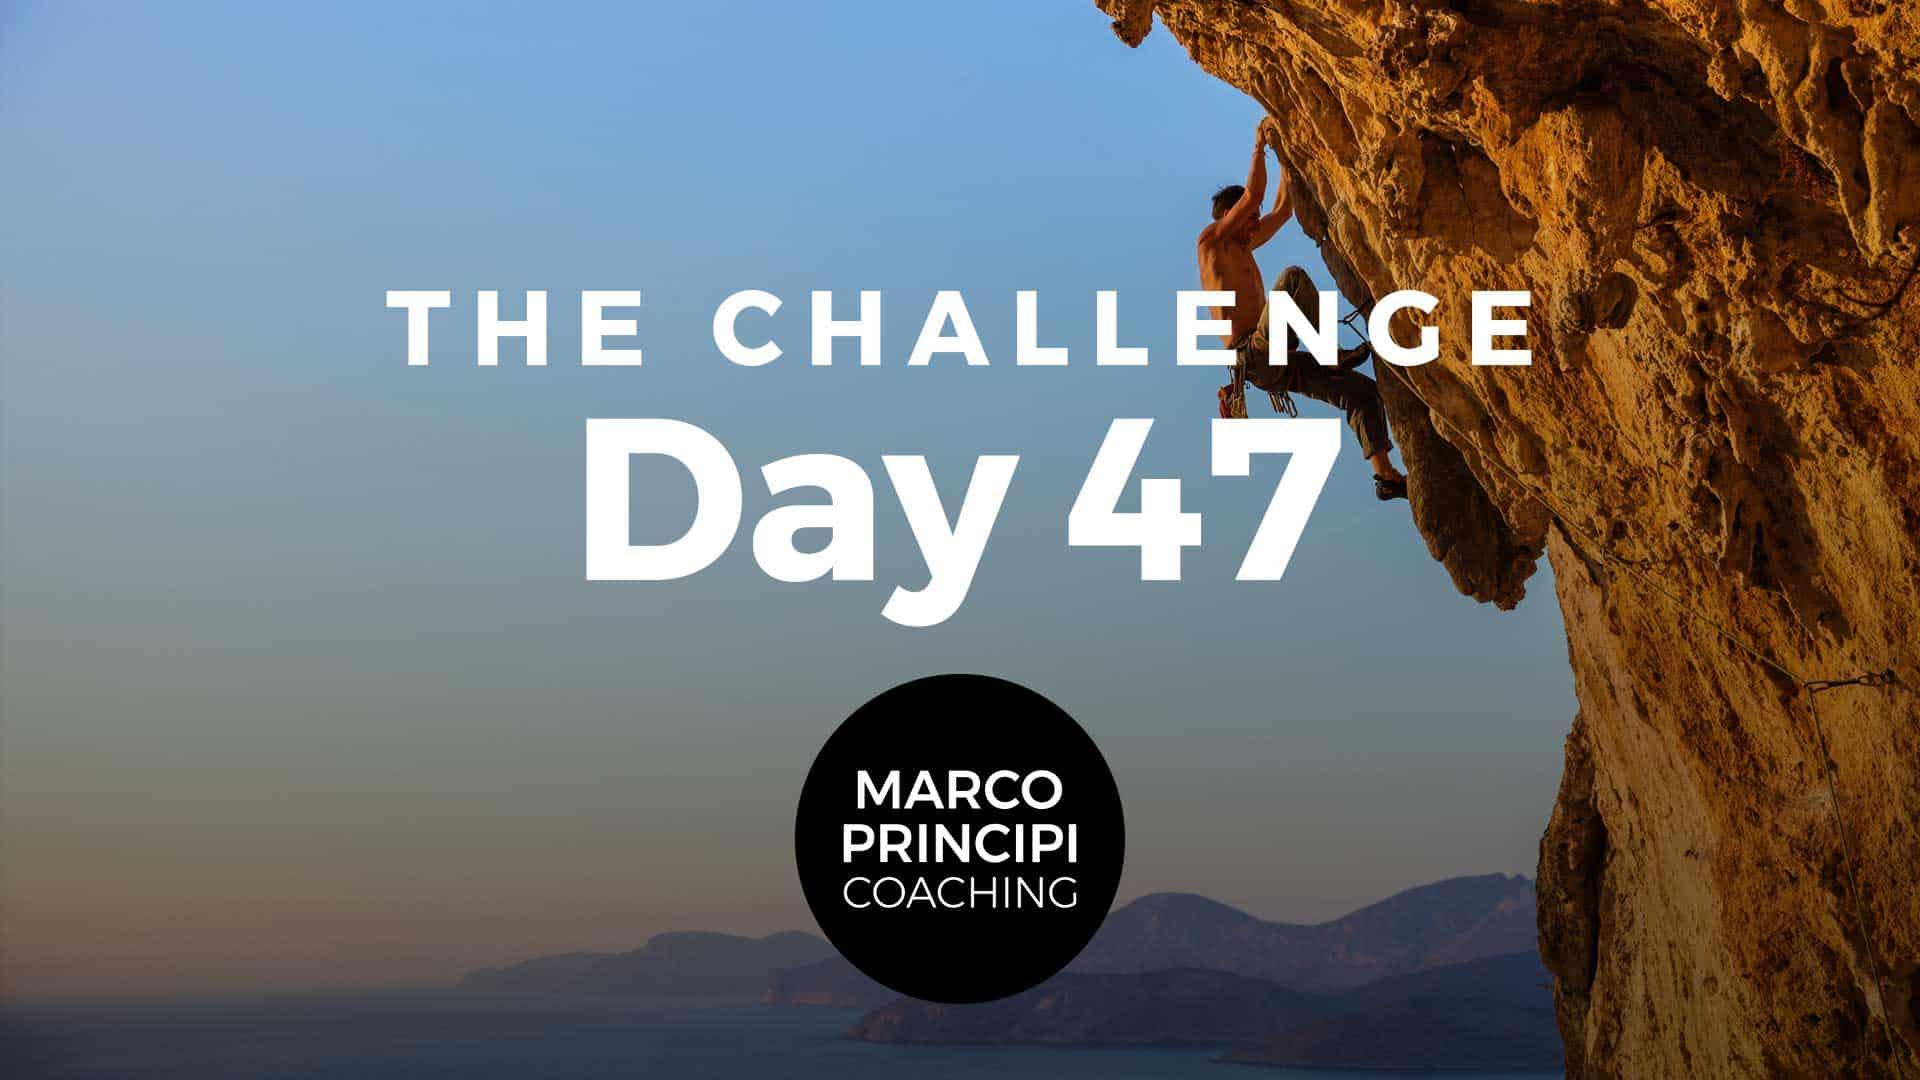 Marco Principi The Challenge Day 47